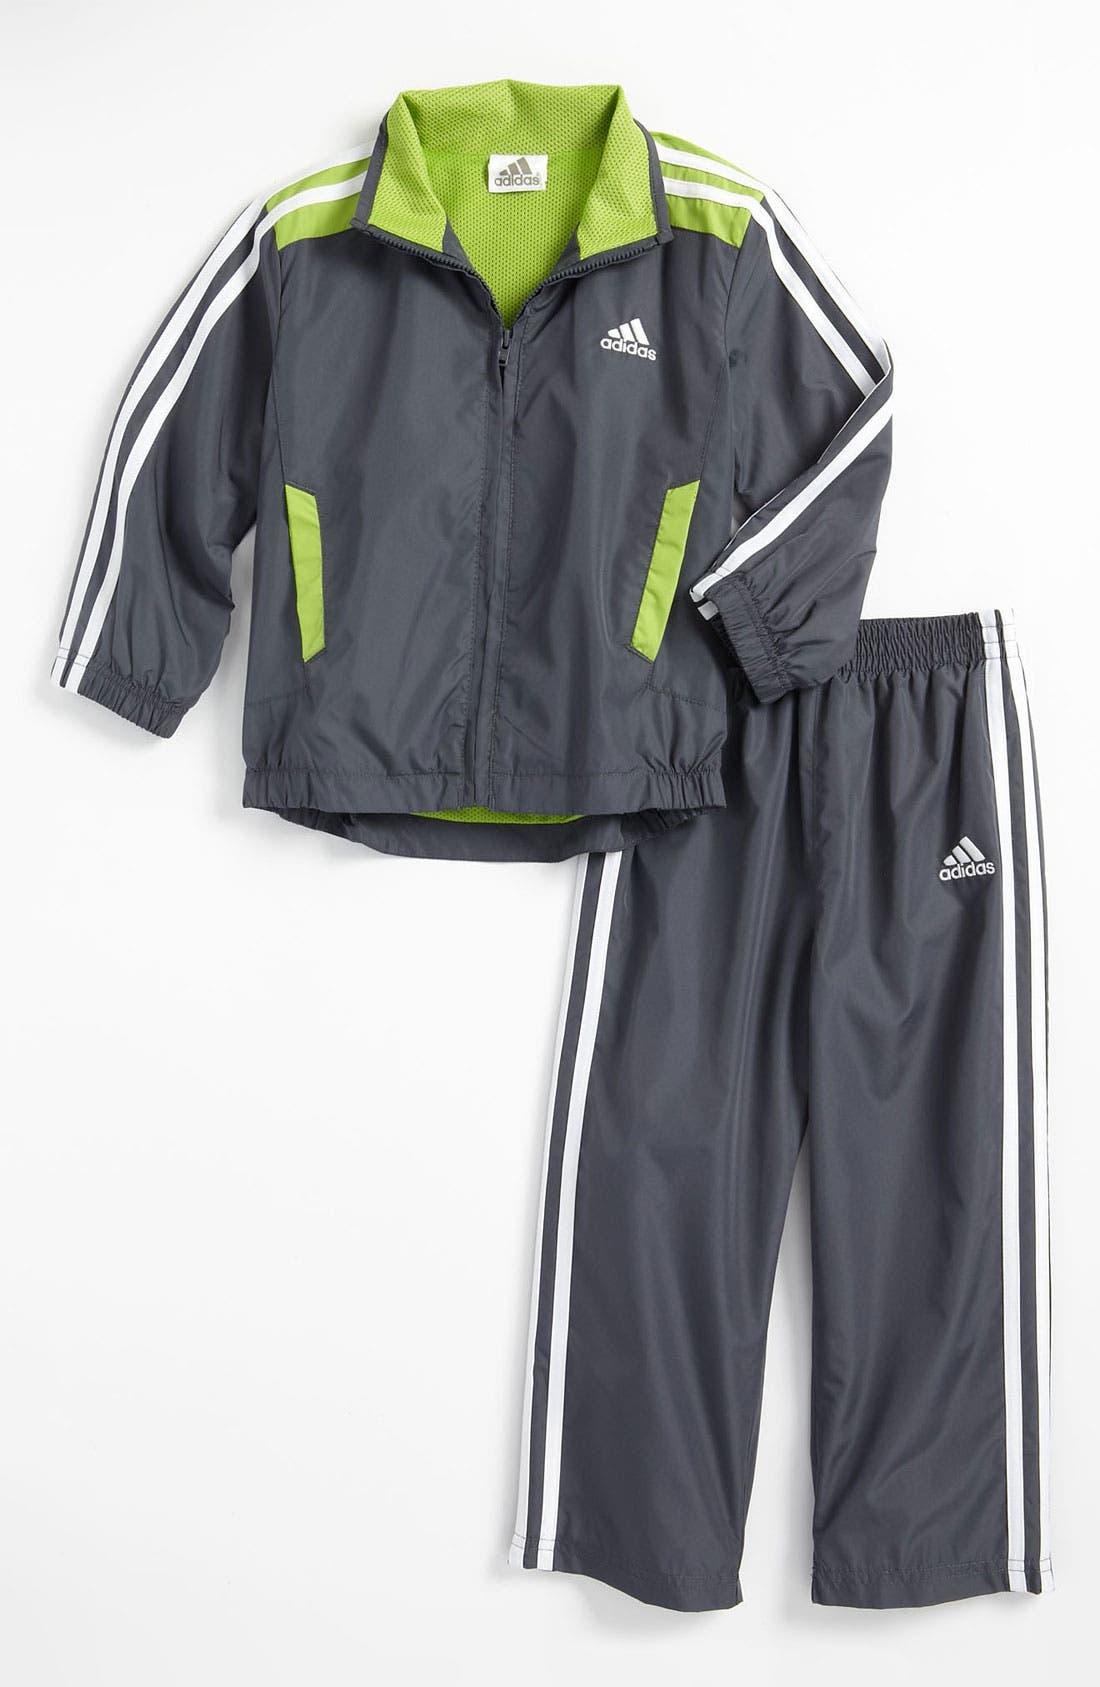 Alternate Image 1 Selected - adidas 'Essential Q15' Jacket & Pants (Toddler)